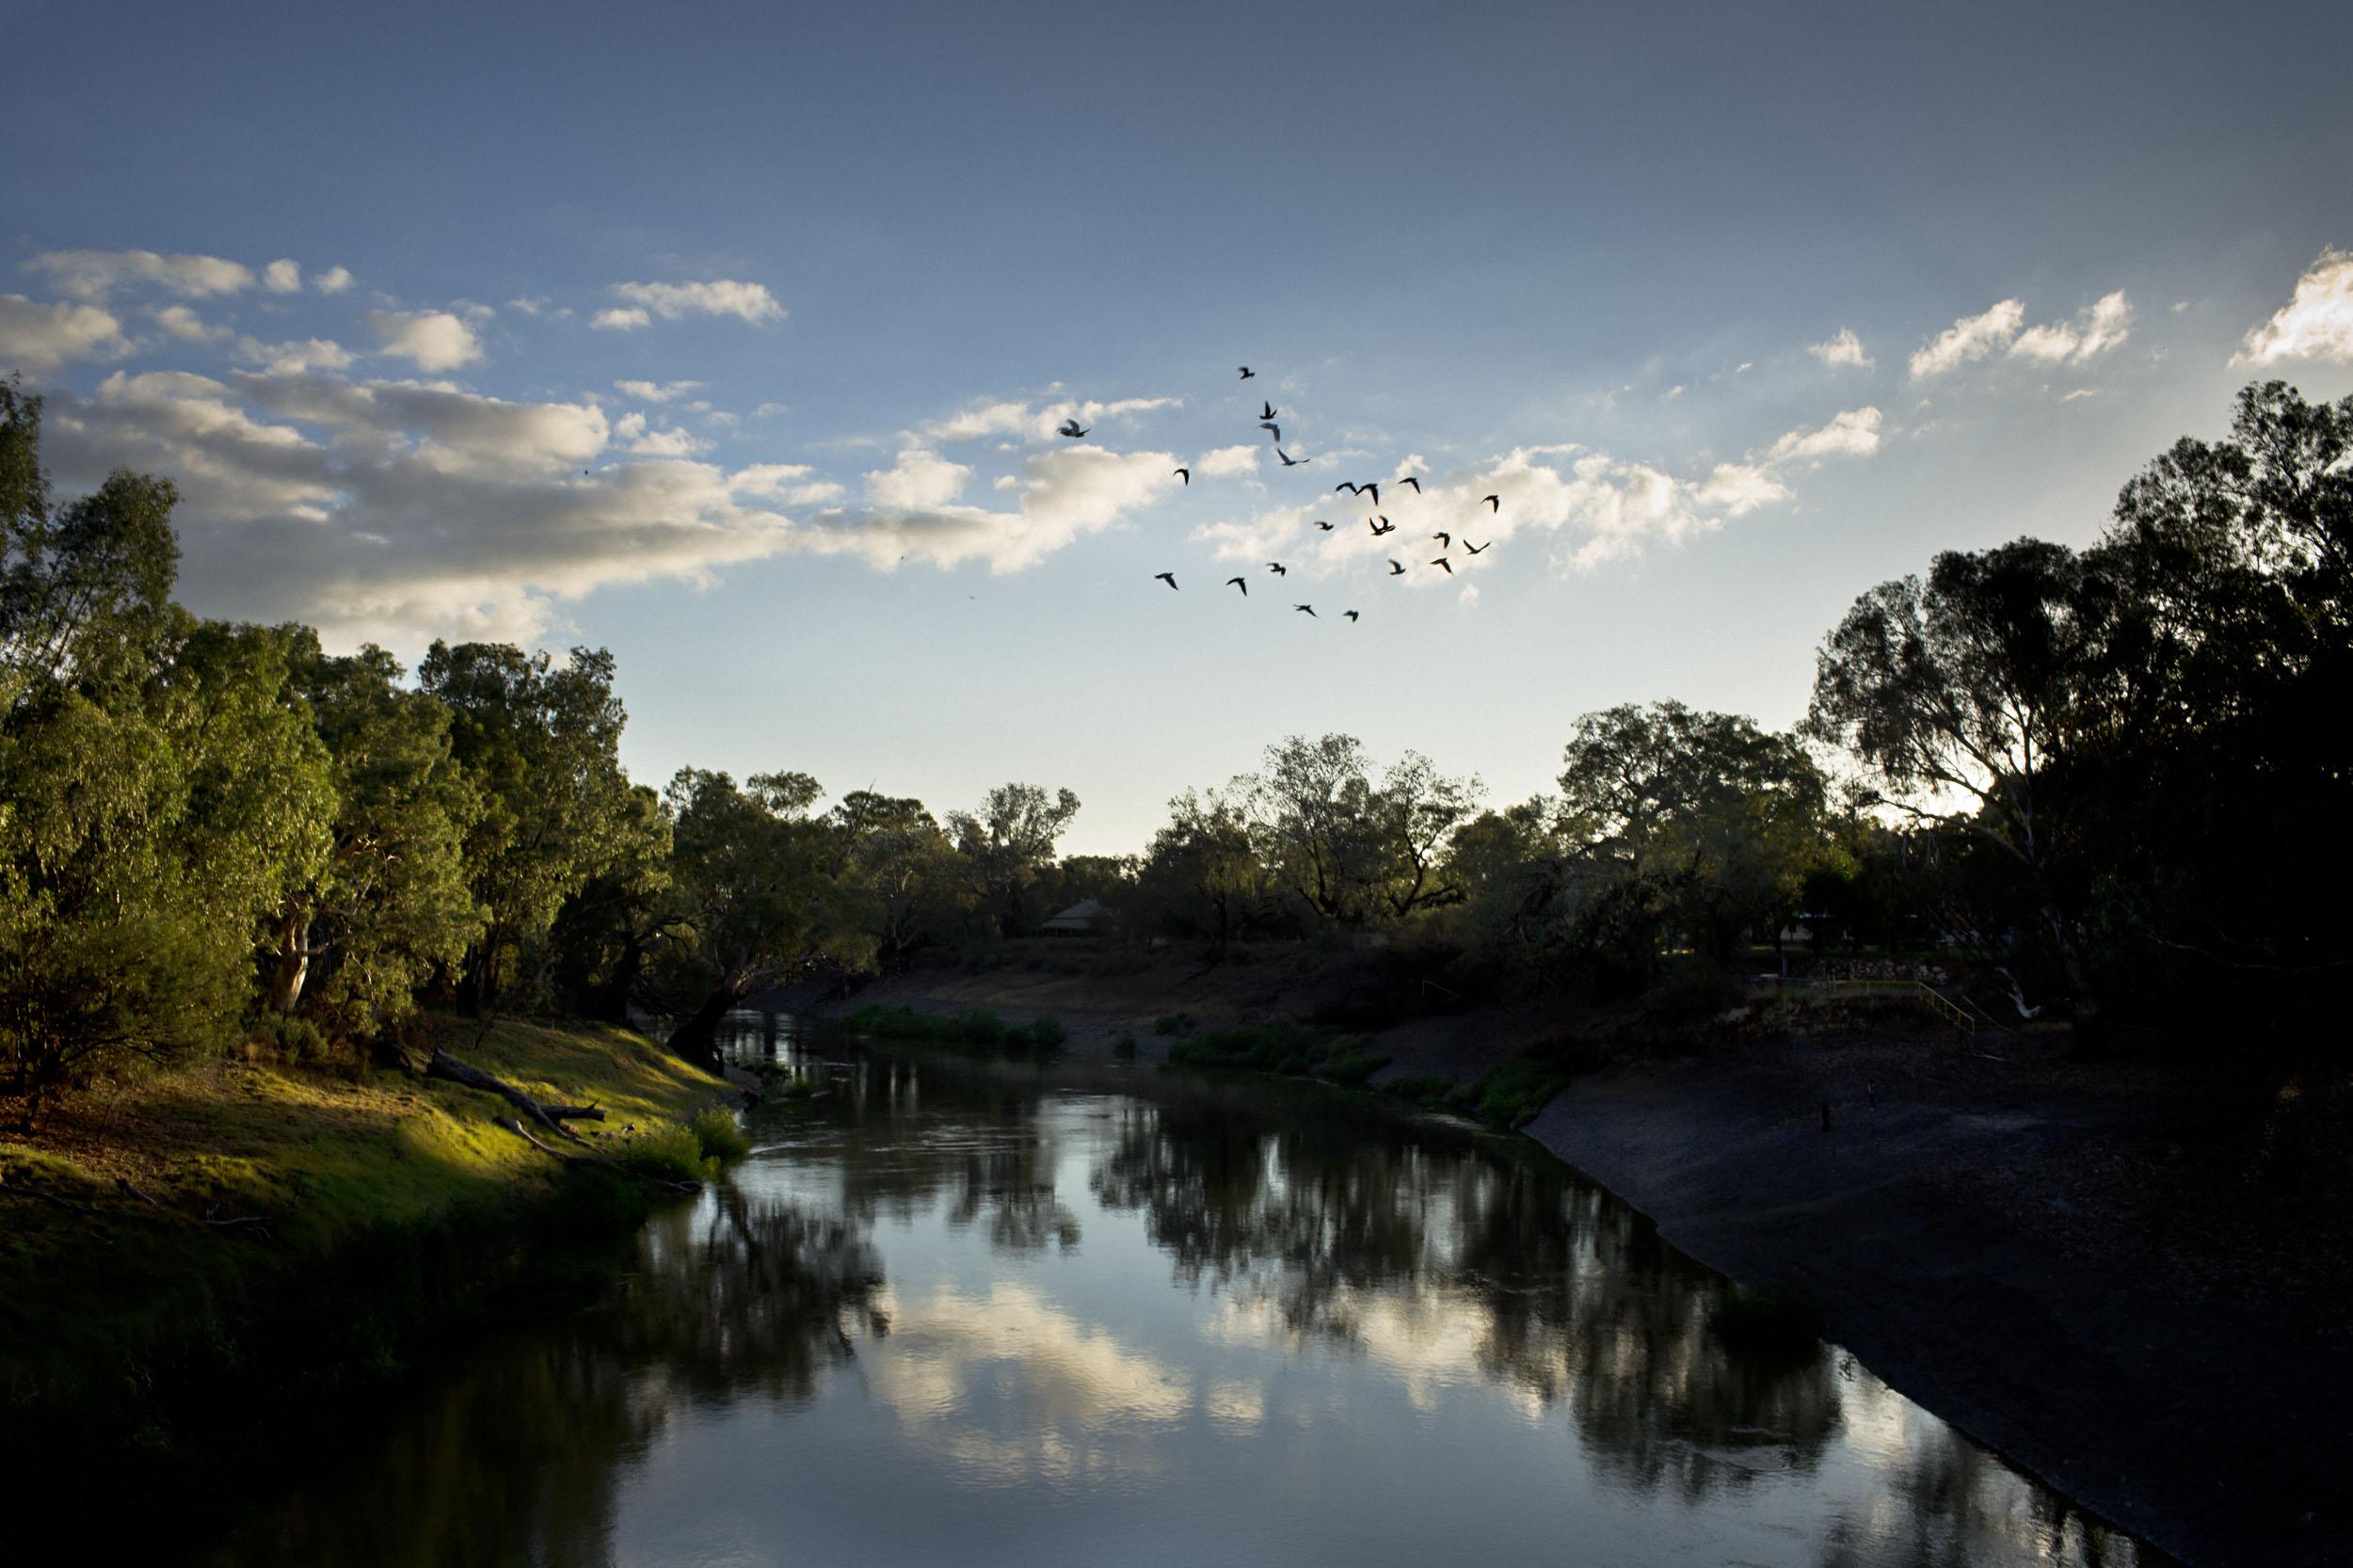 The Darling river, lifeblood to the Barkindji people in Wilcannia, NSW.